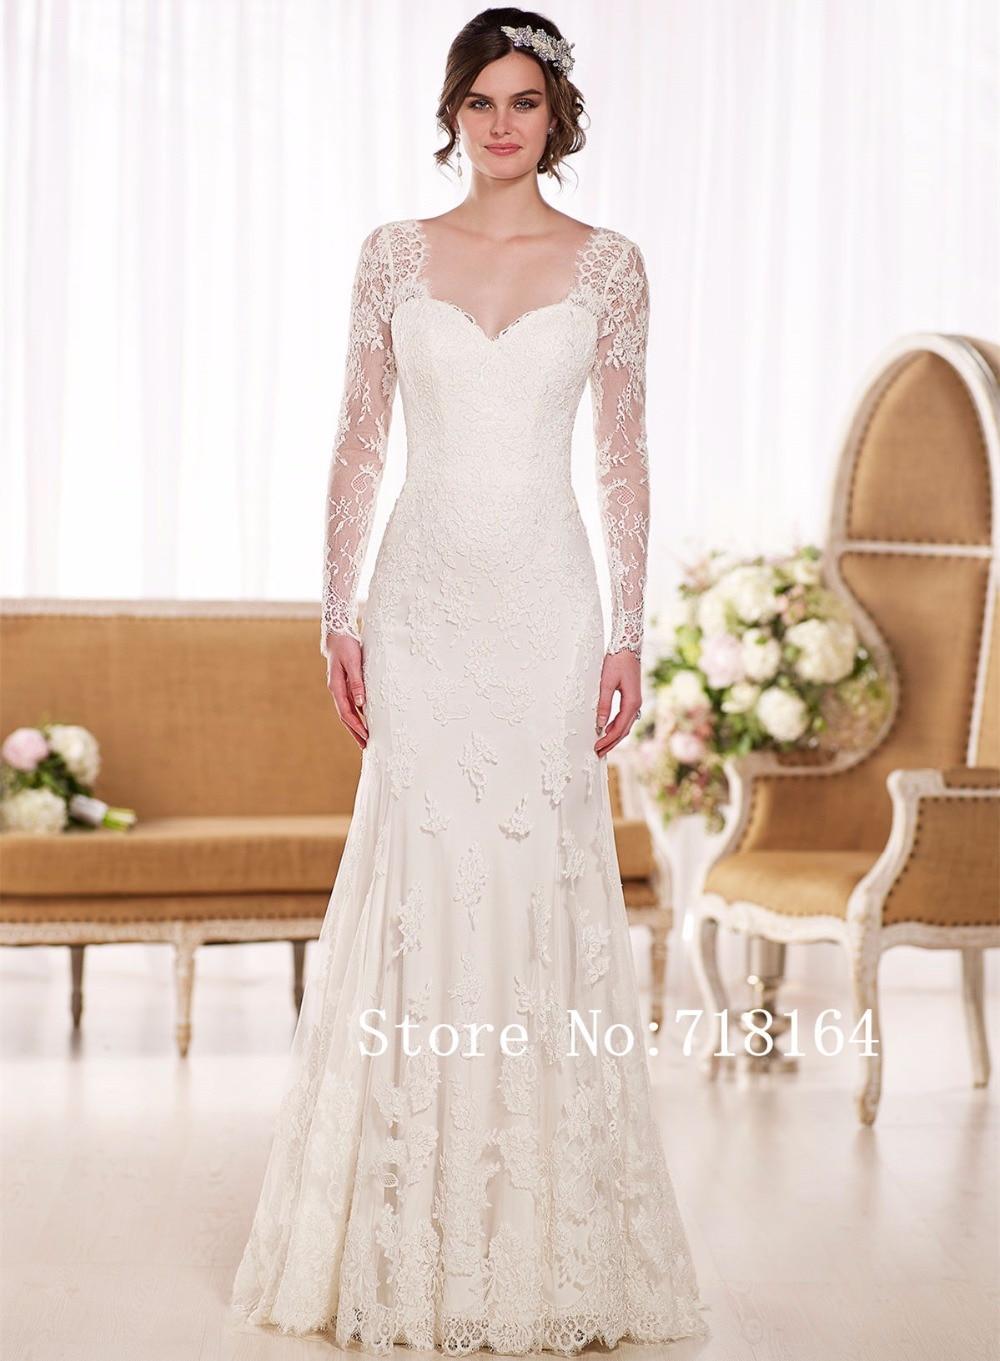 Bridal sort 20a&page 3 modest wedding dresses M AB